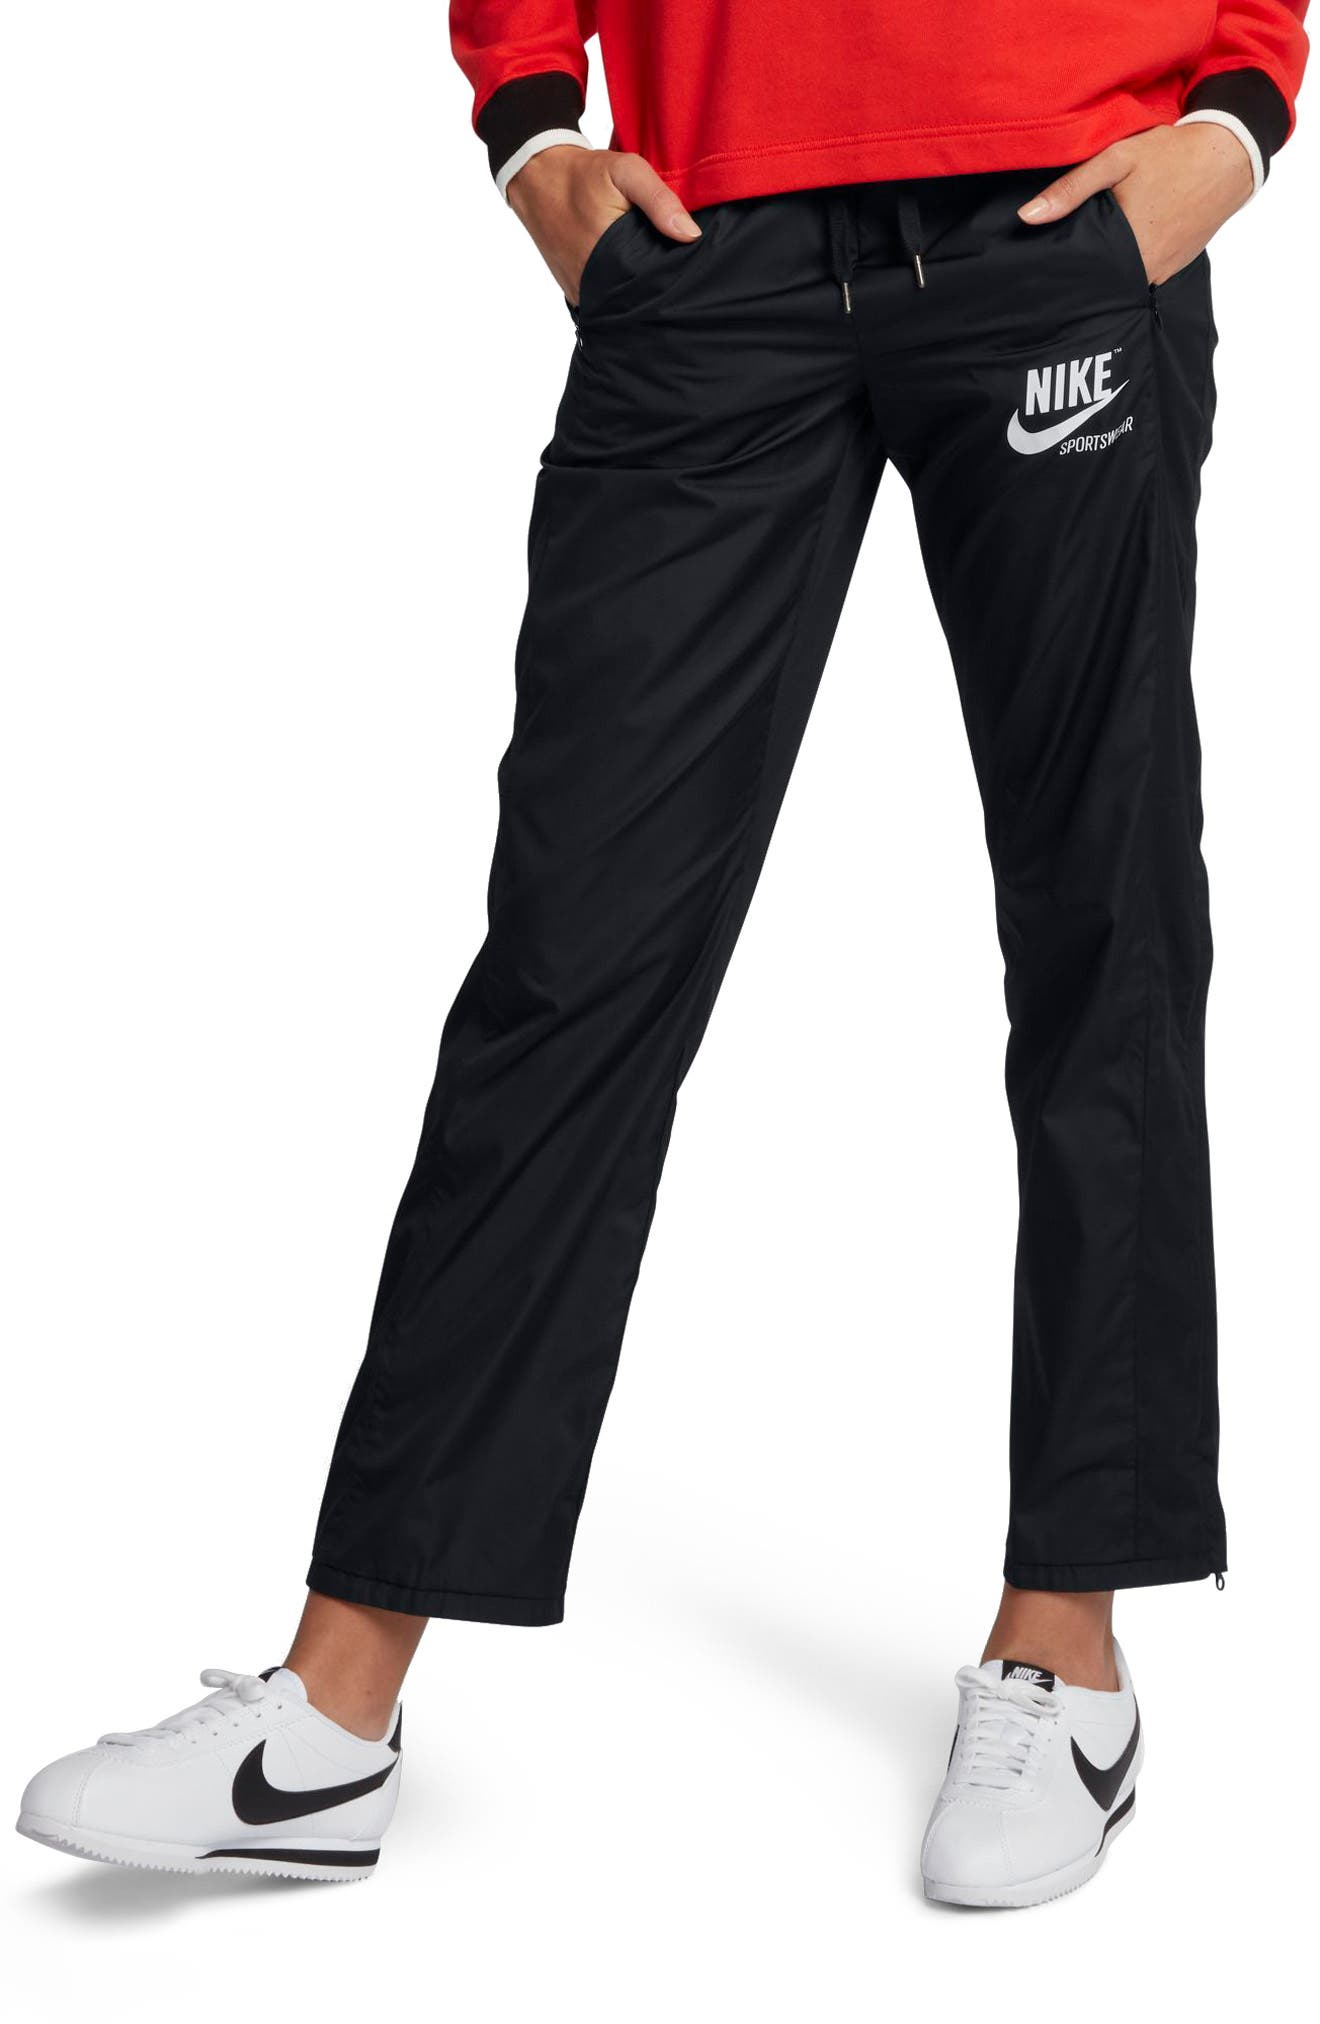 Sportswear Women's Stretch Faille Pants,                         Main,                         color, Black